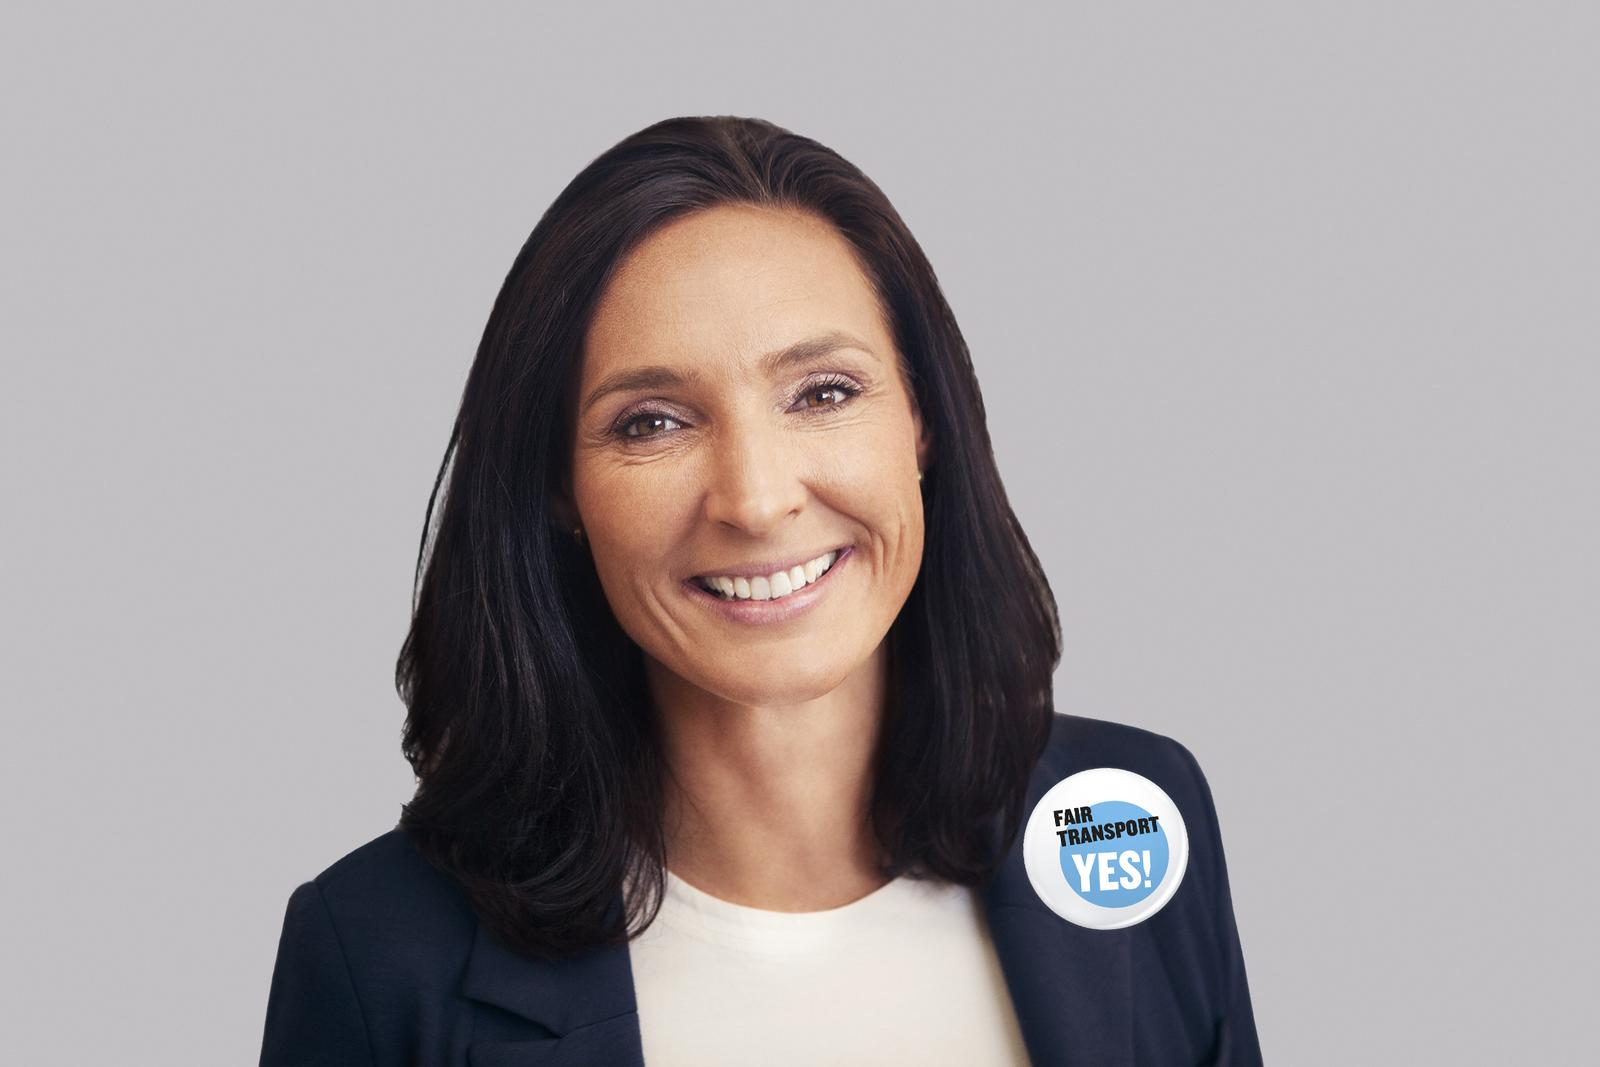 Christa Ceré, formand for Cabin Attendants Union.